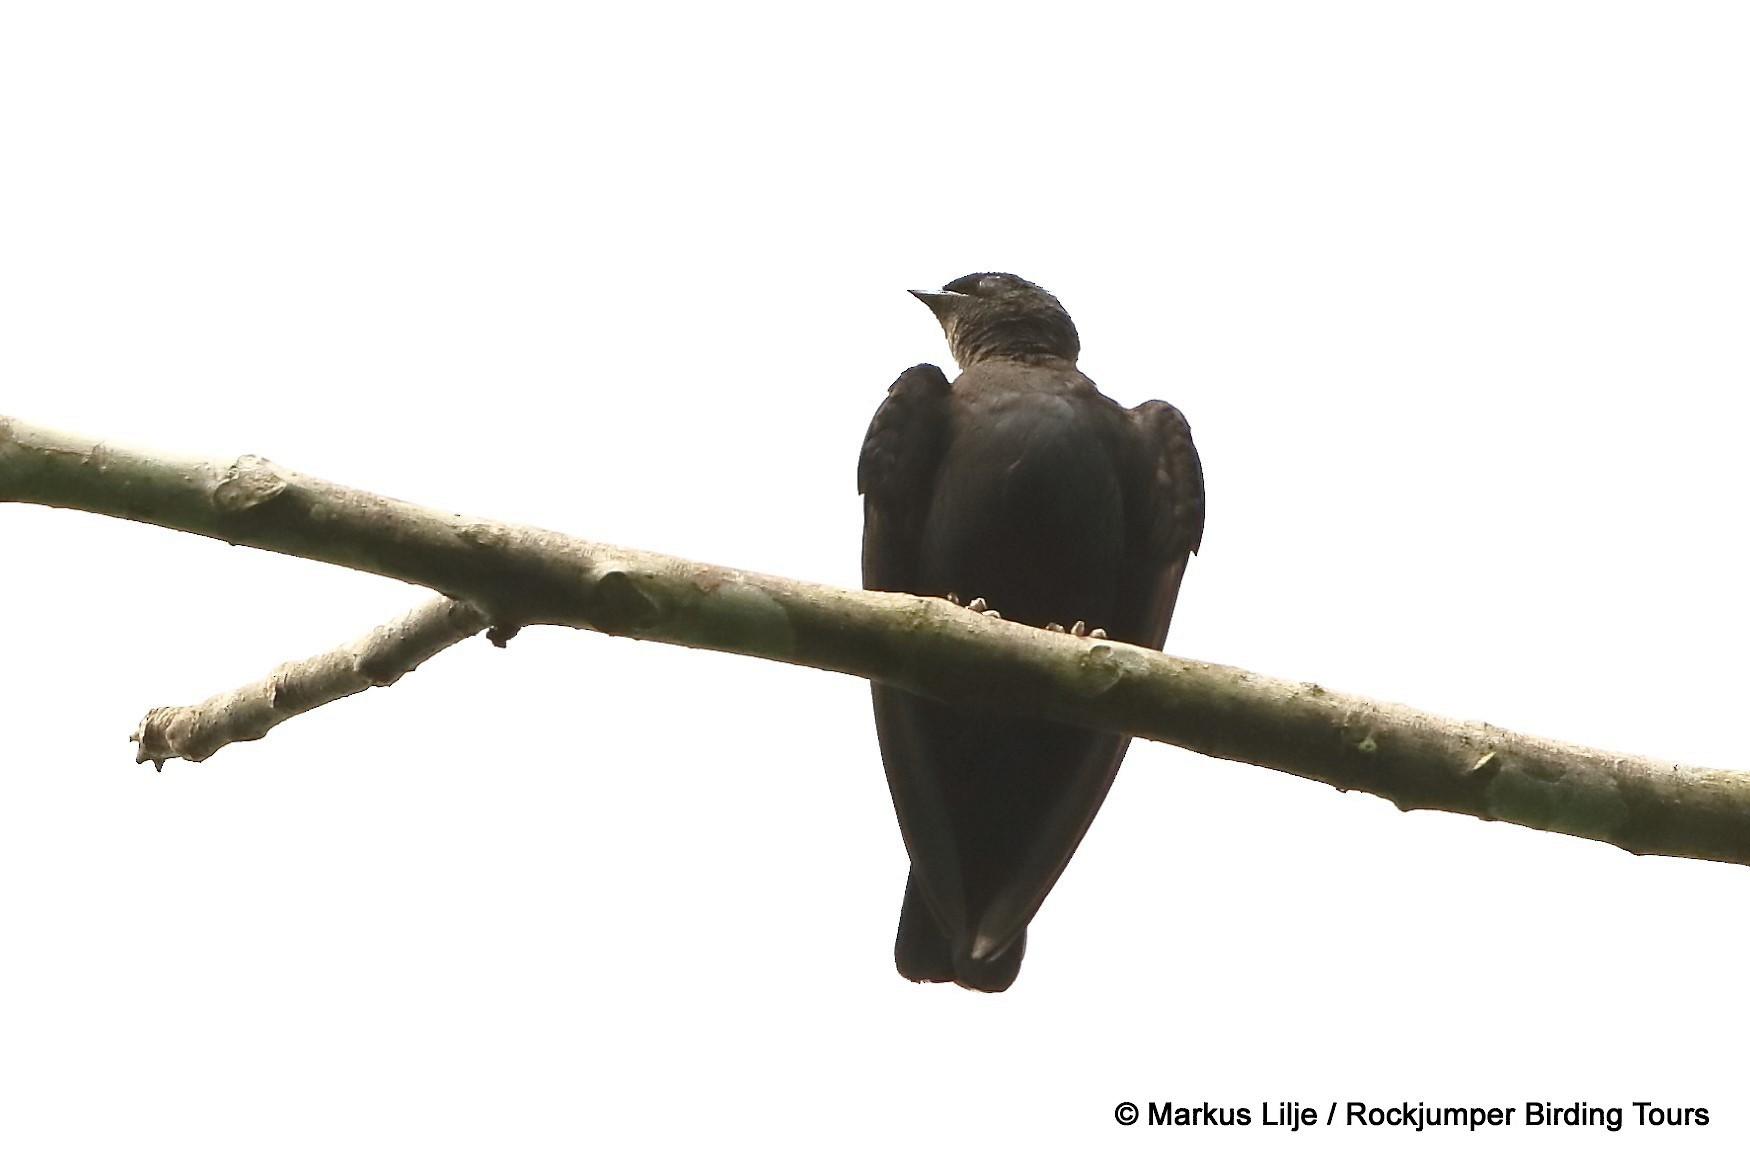 Square-tailed Sawwing - Markus Lilje